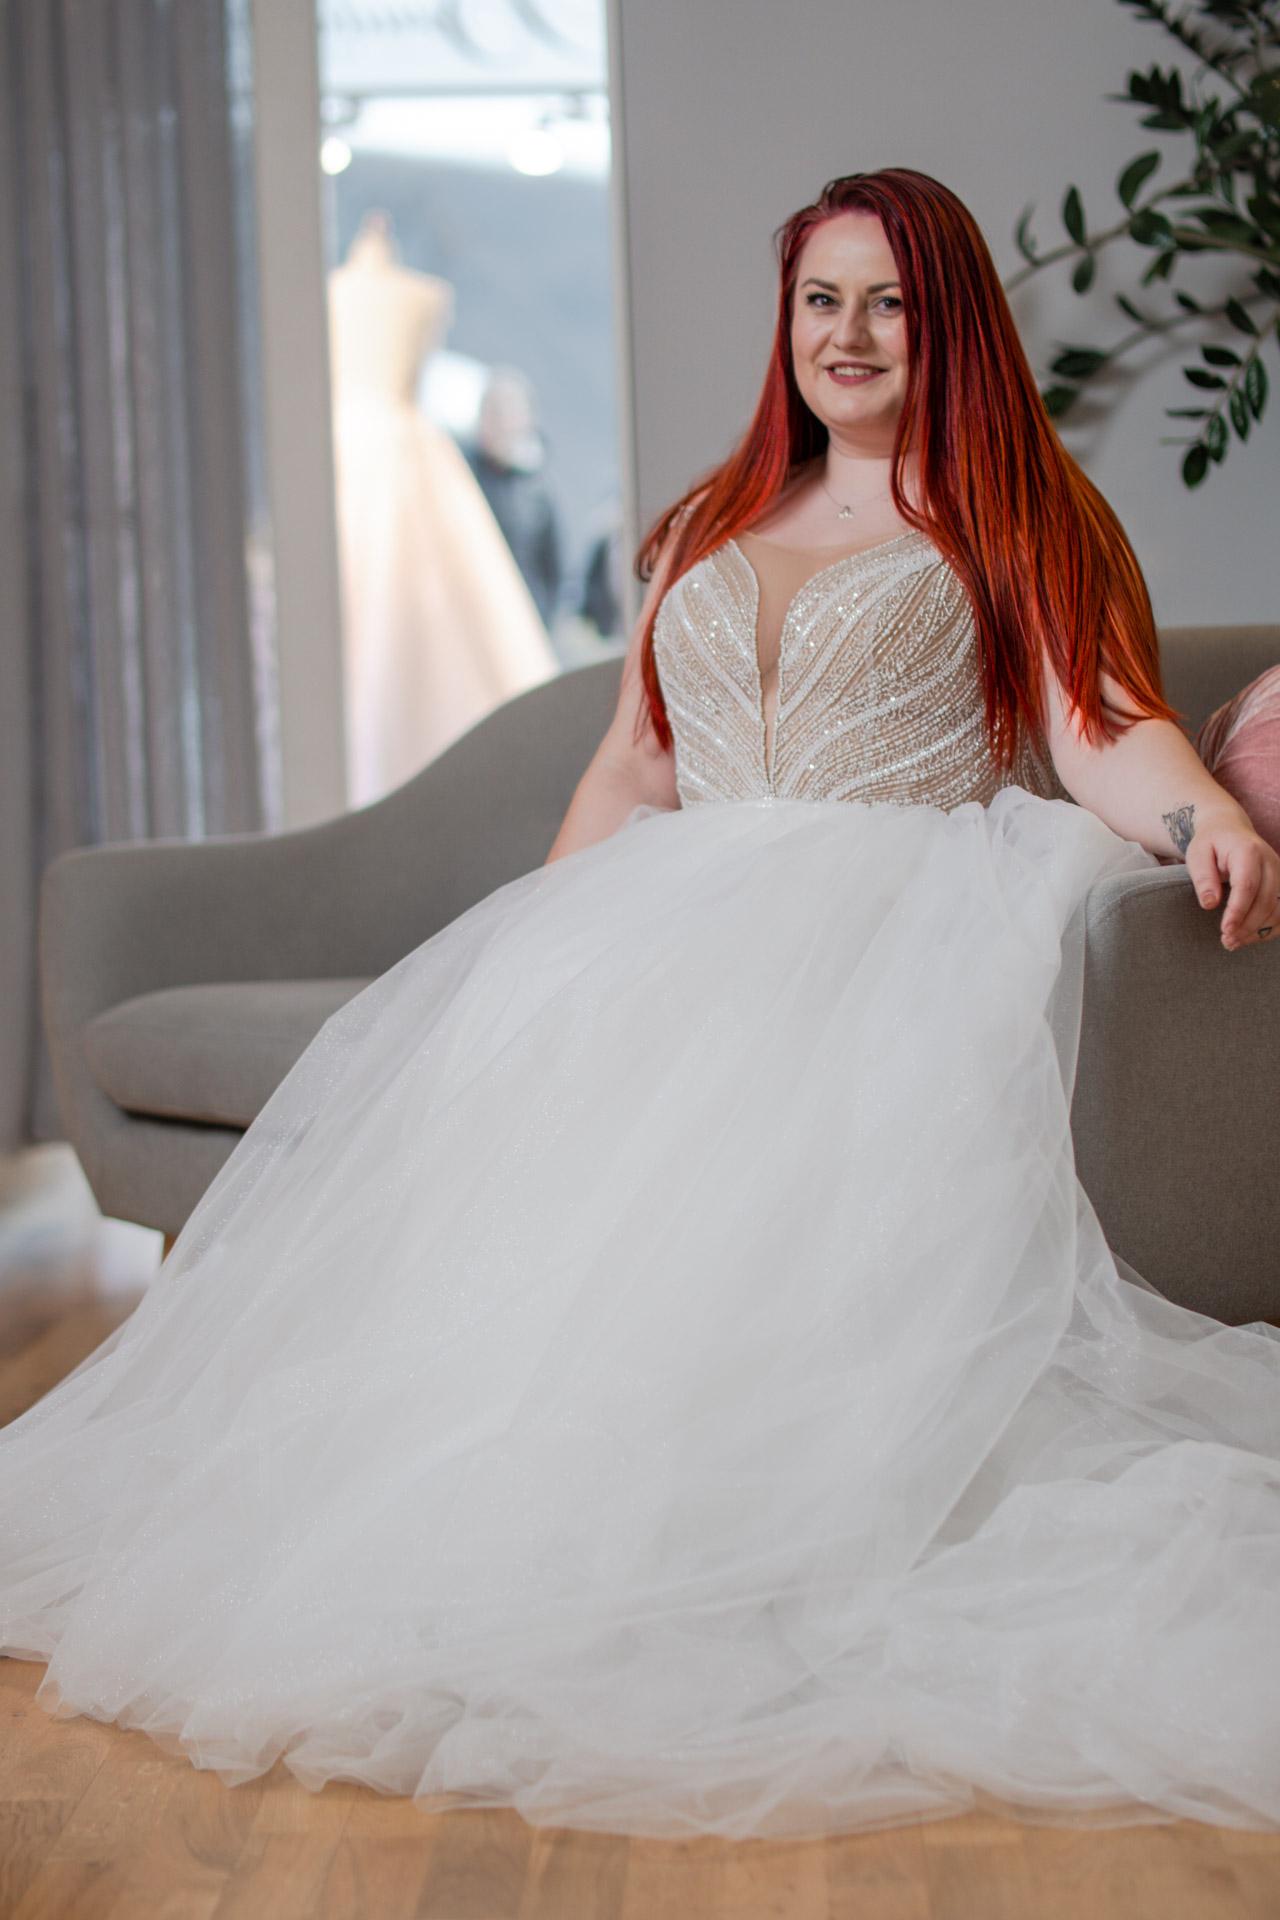 Brud i brudekjole sitter på sofaen